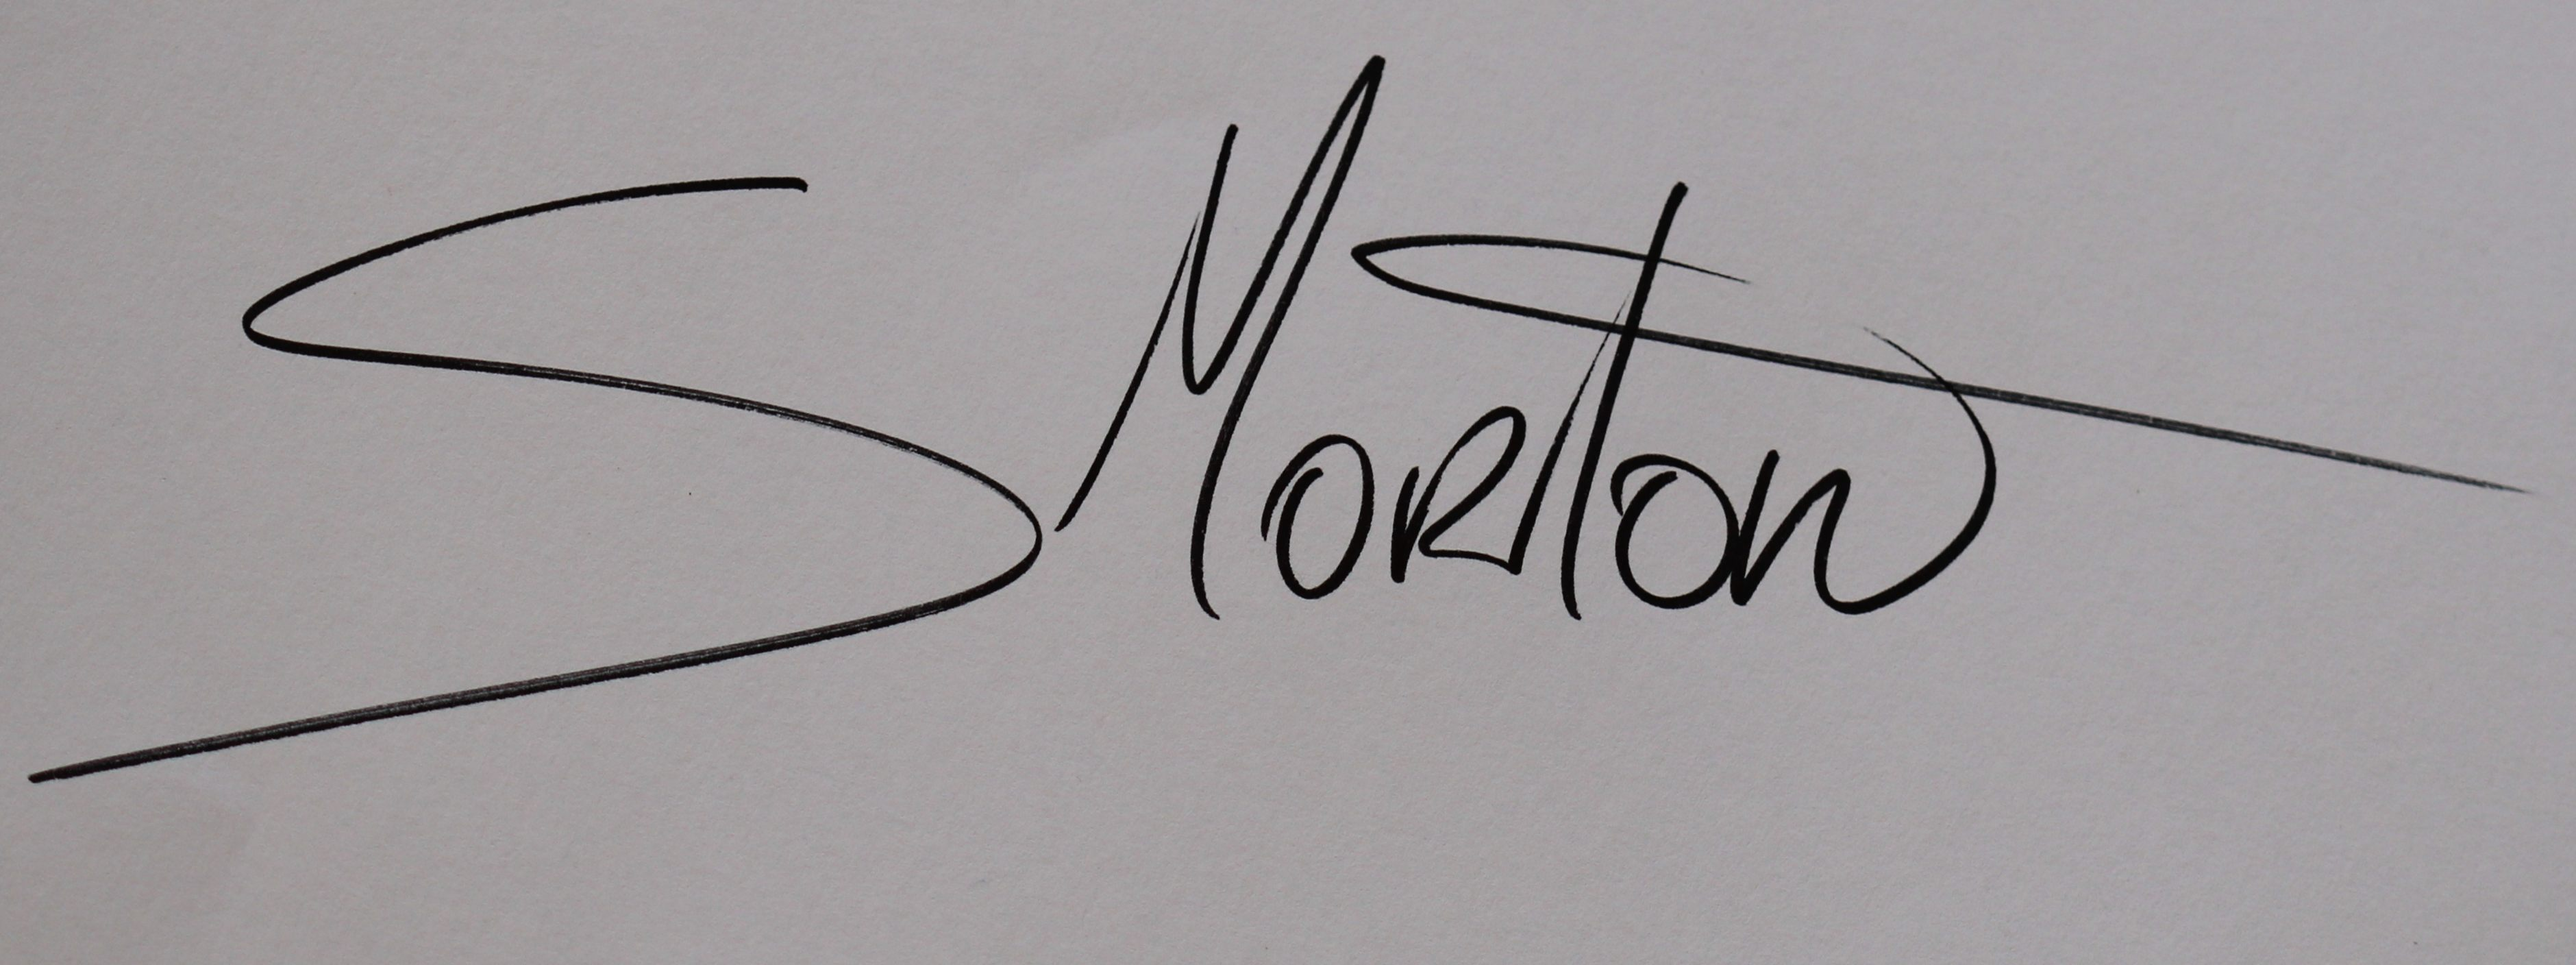 Sussanne Morton's Signature